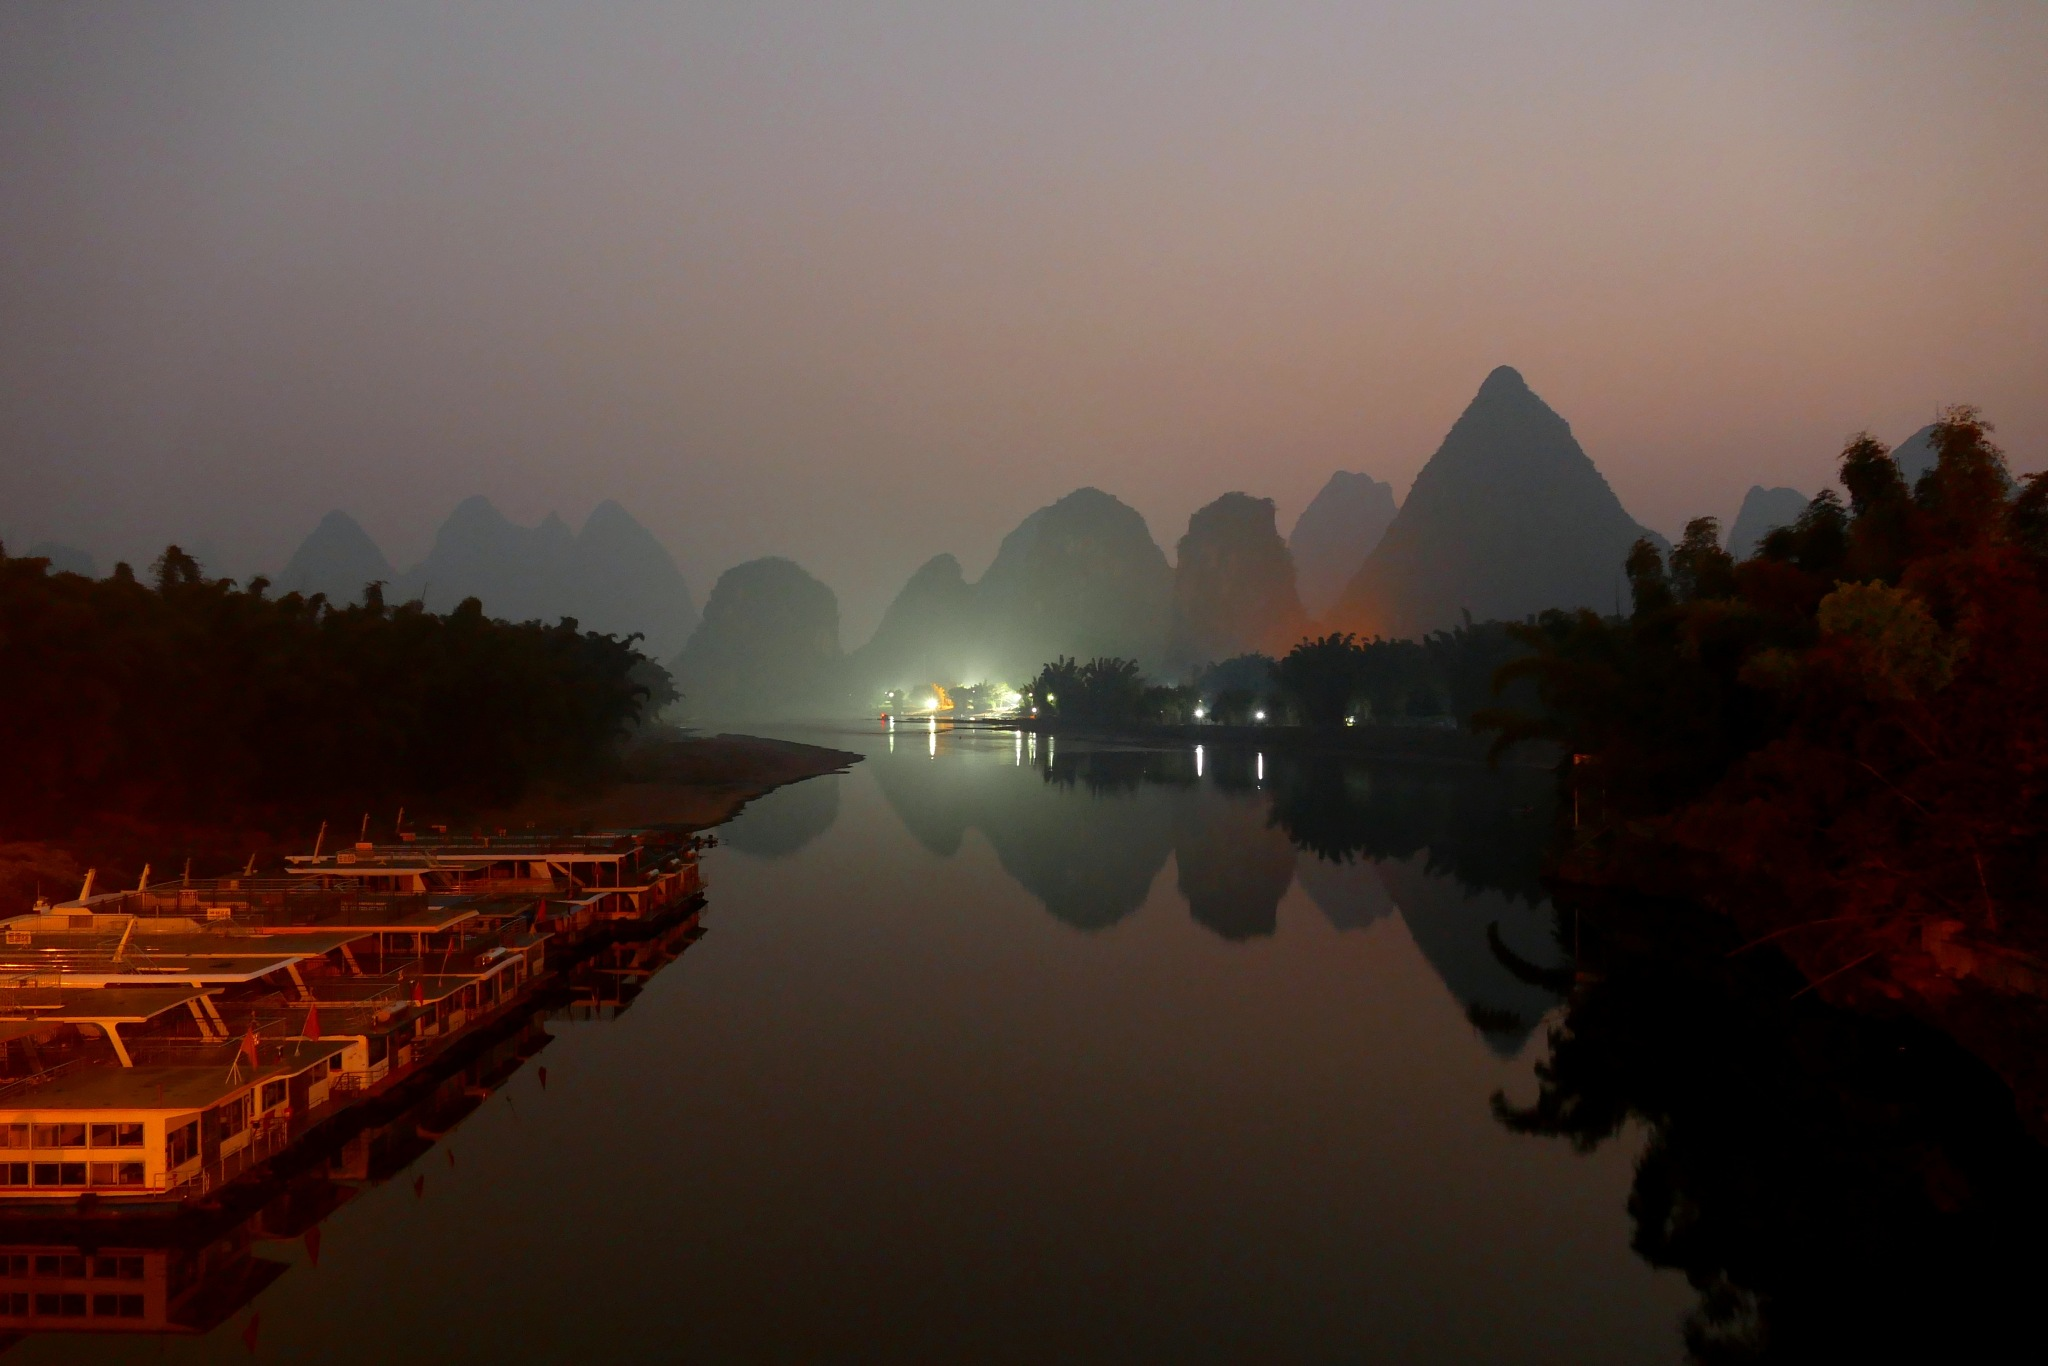 Li River, just before dawn by pop88123